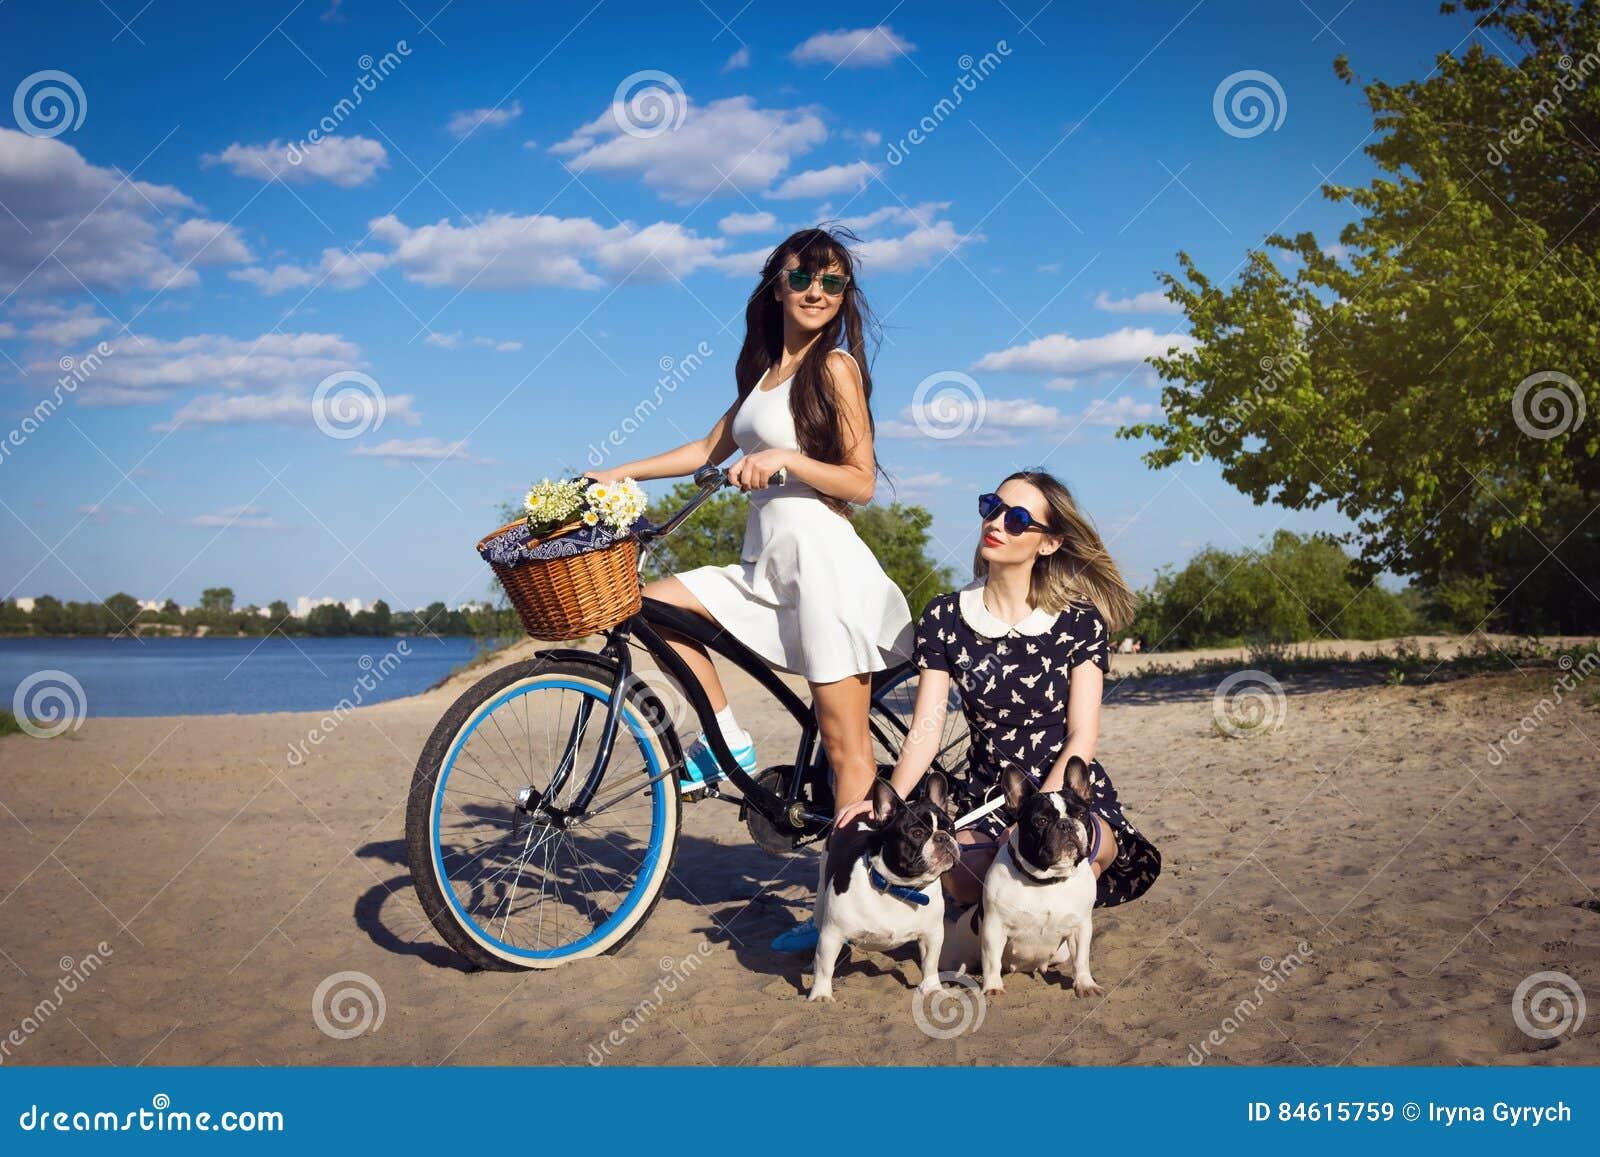 Preferenza Ragazze In Bicicletta BS71 » Regardsdefemmes VQ87